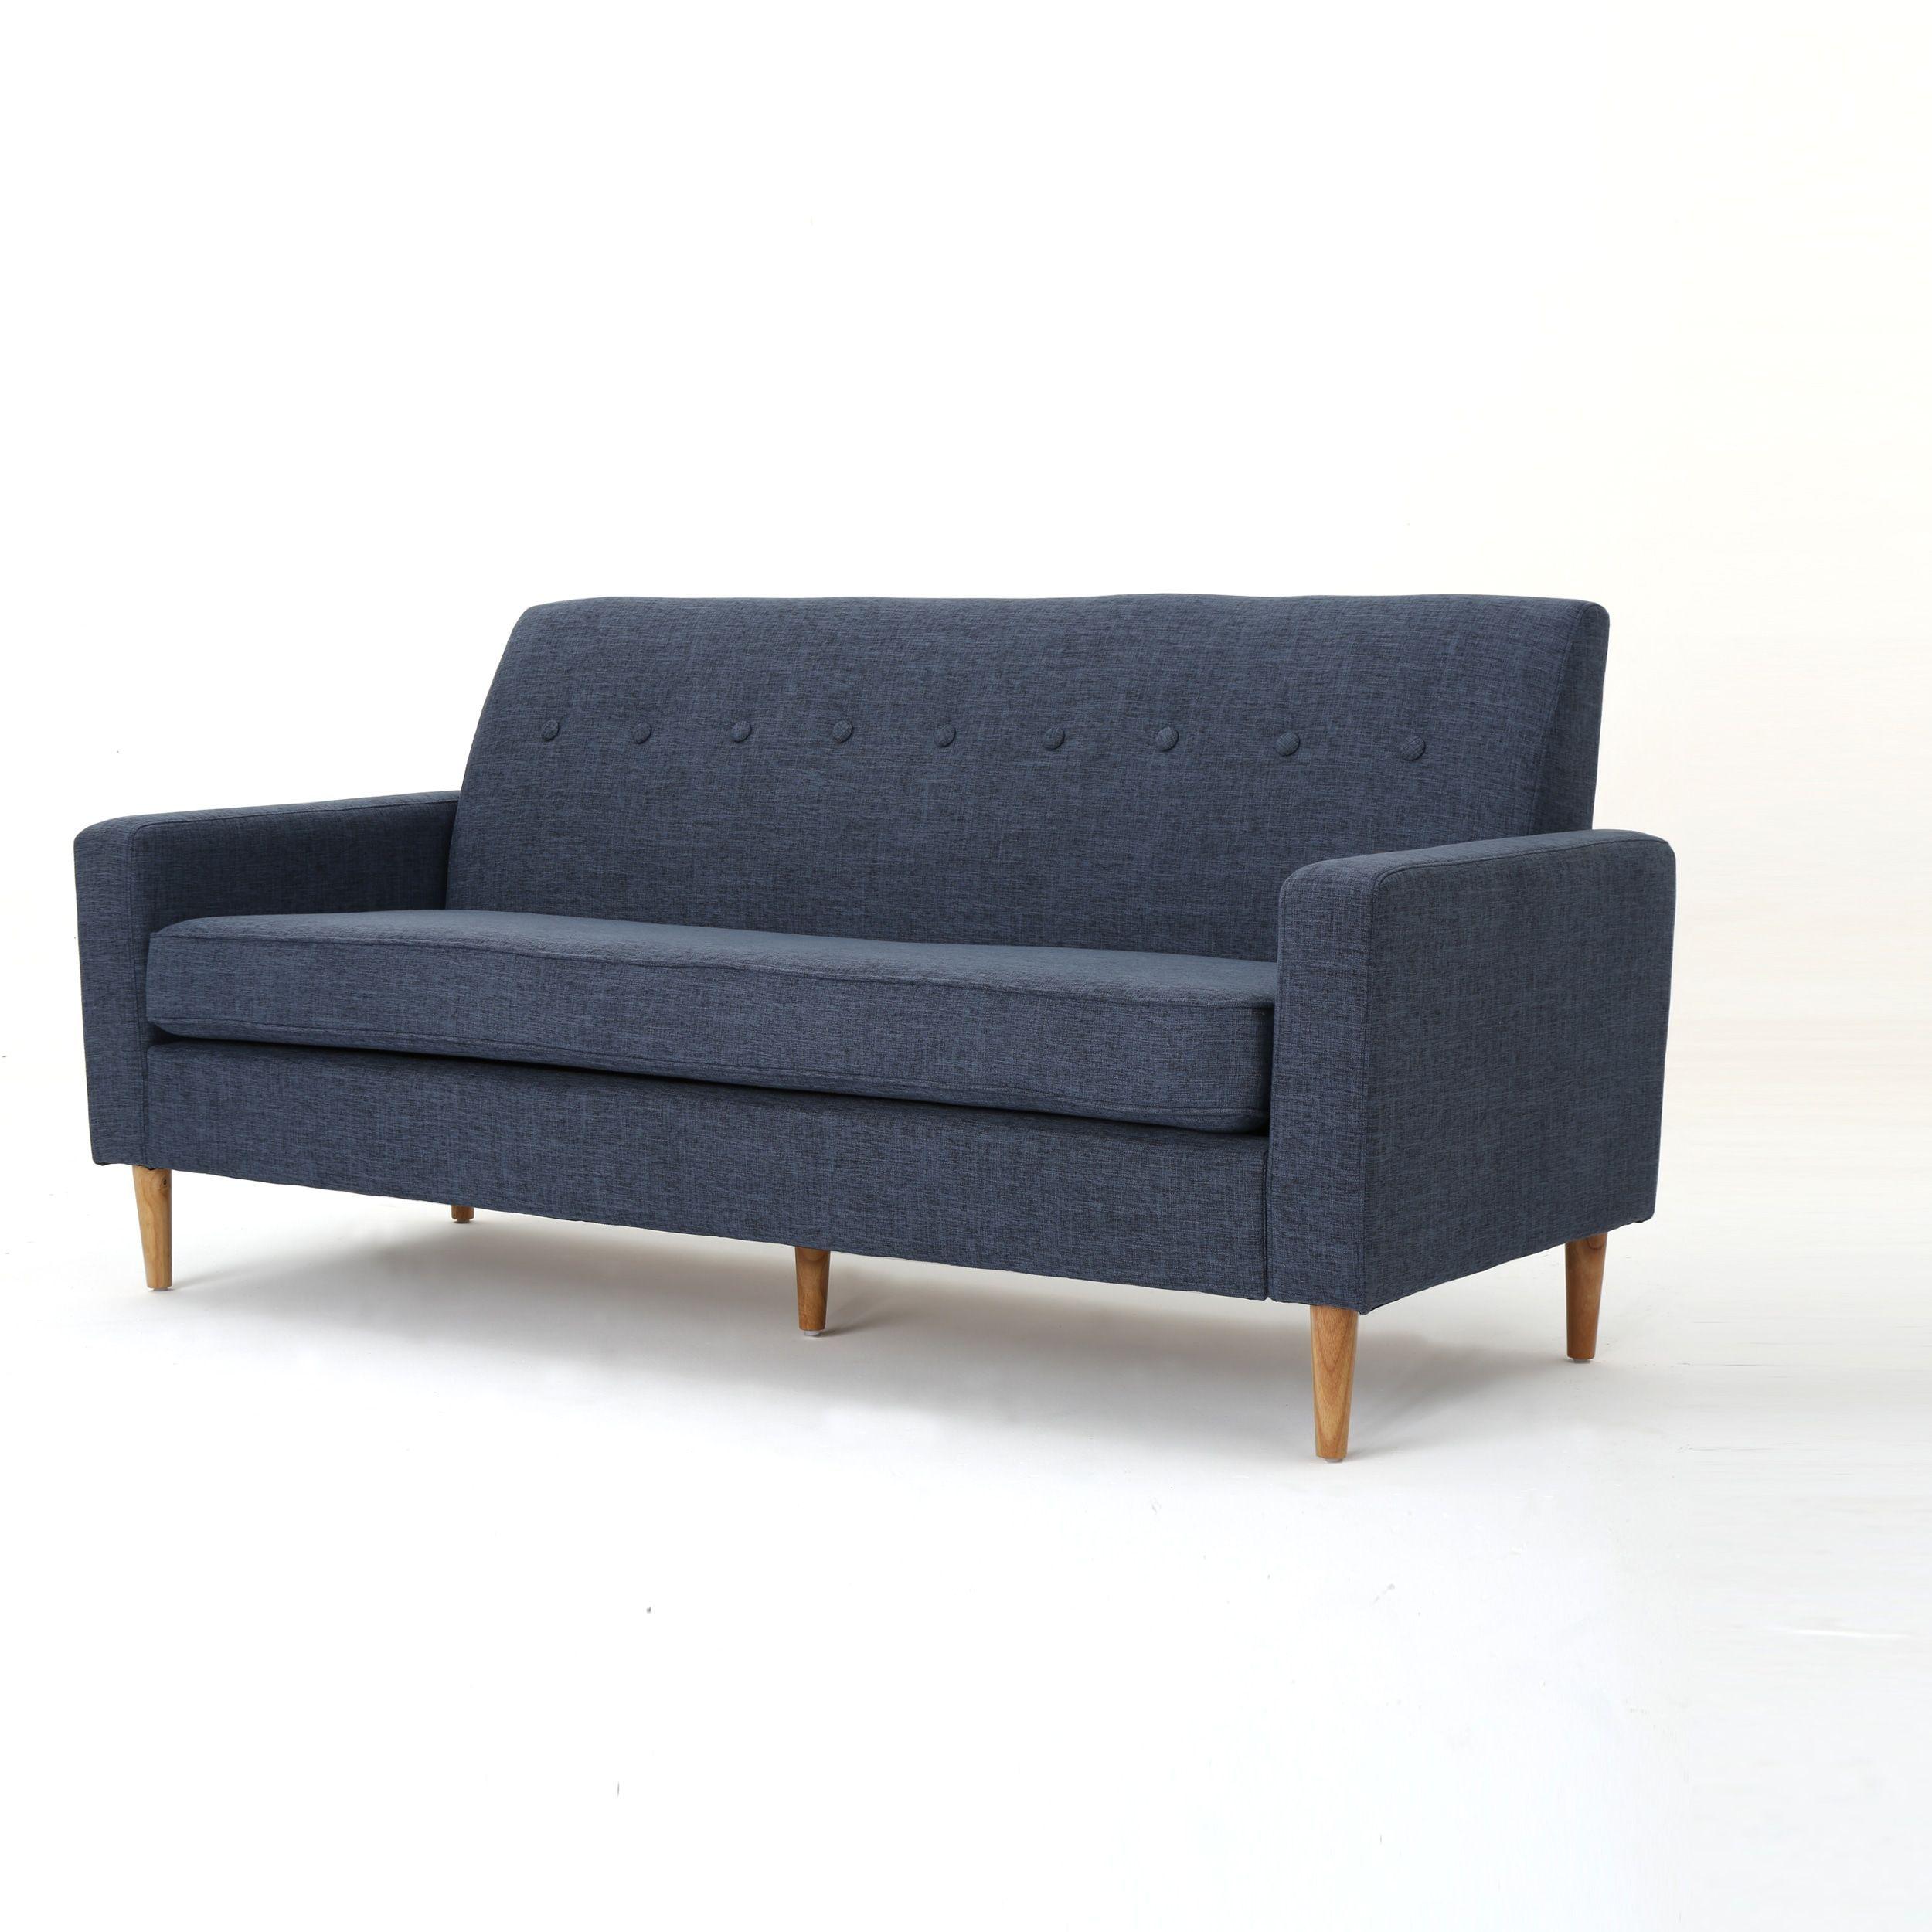 Sawyer Mid Century Modern 3-seater Fabric Sofa by ...